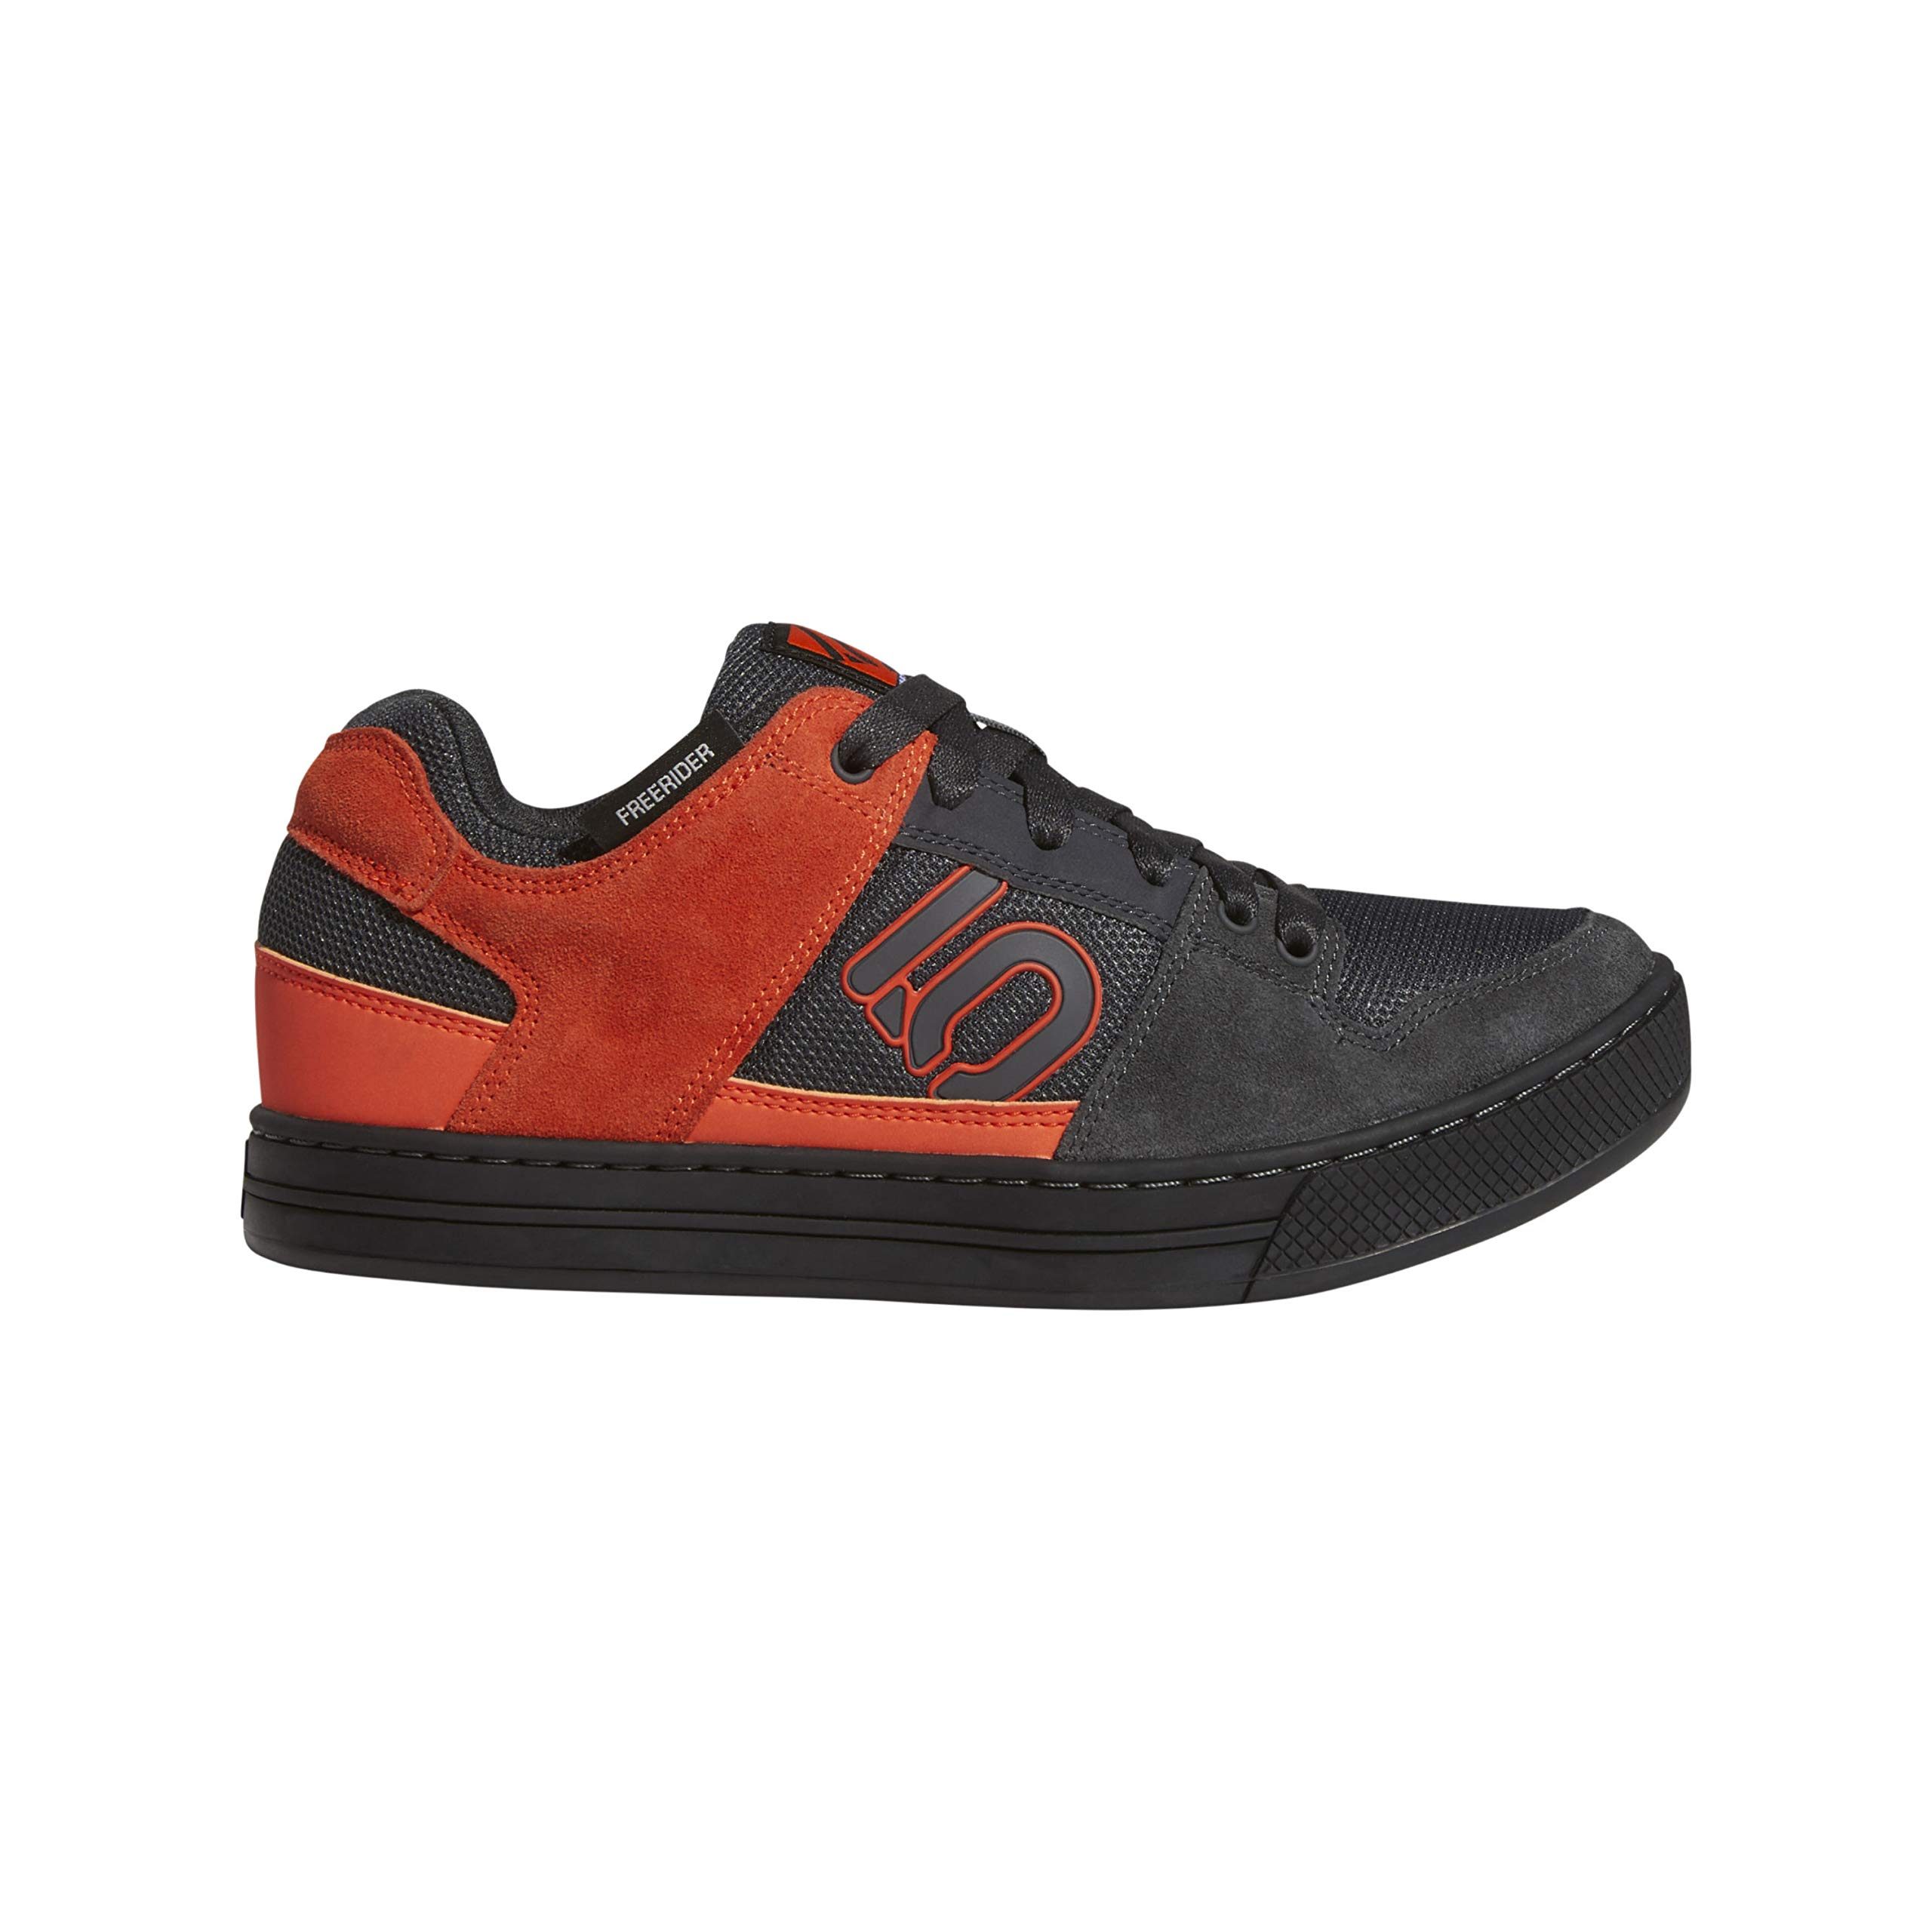 Five Ten Freerider Mens Mountain Bike Shoe Carbon/Active Orange/Grey Five, Size 8.5